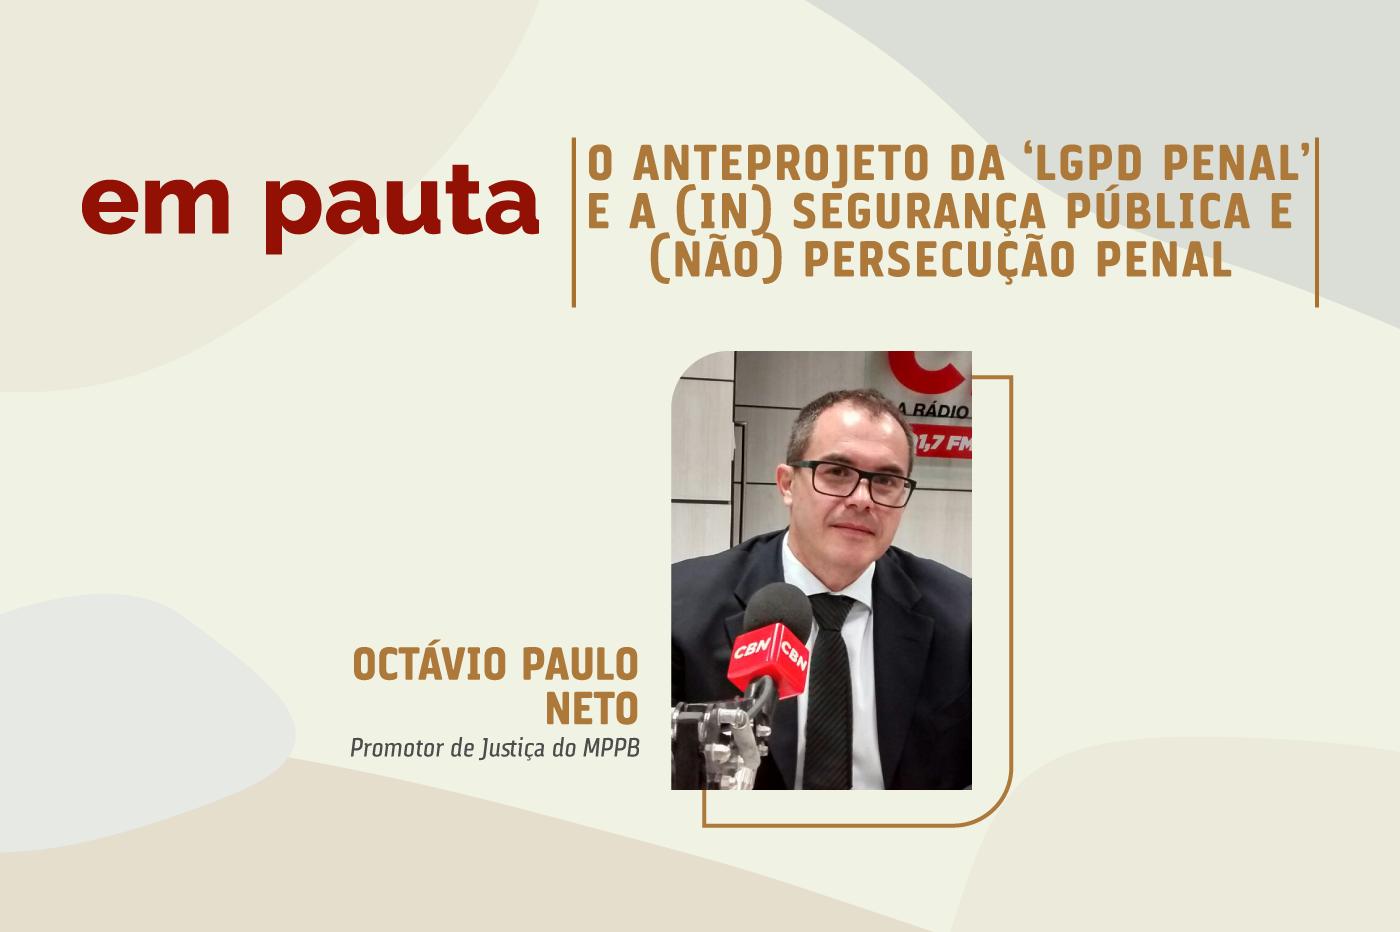 Banner Noticia Em pauta Octavio